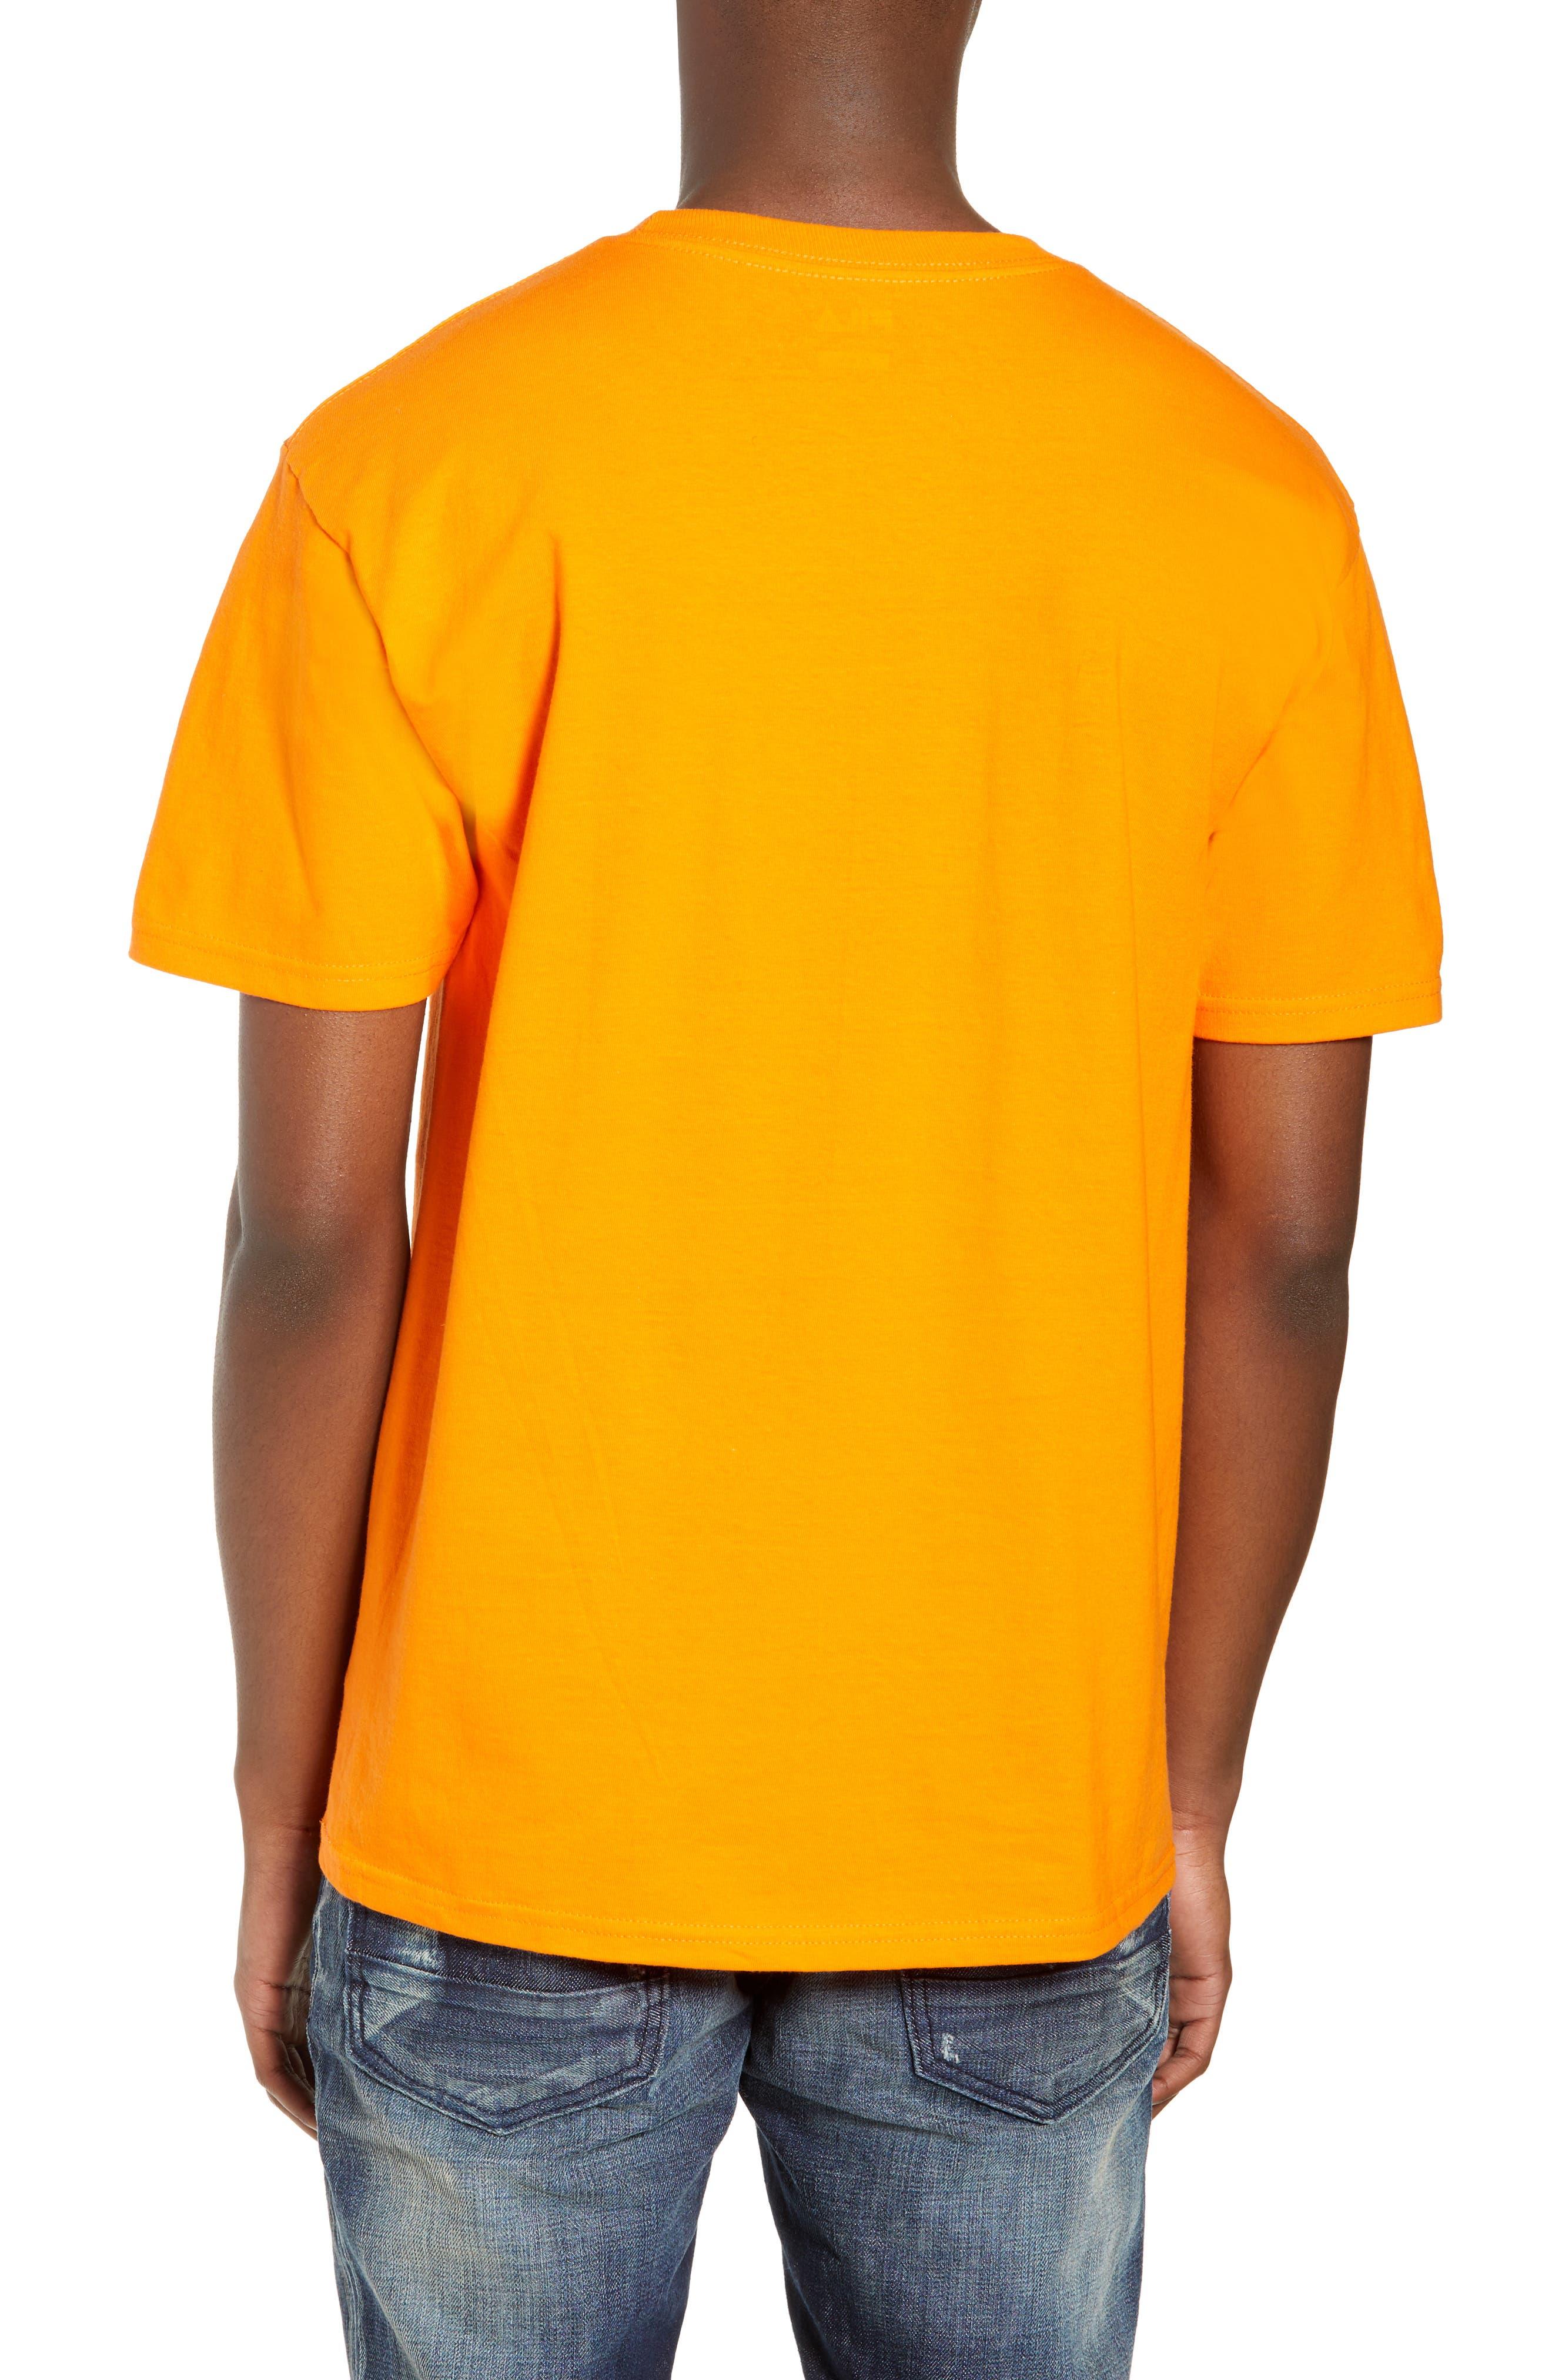 USA Graphic T-Shirt,                             Alternate thumbnail 7, color,